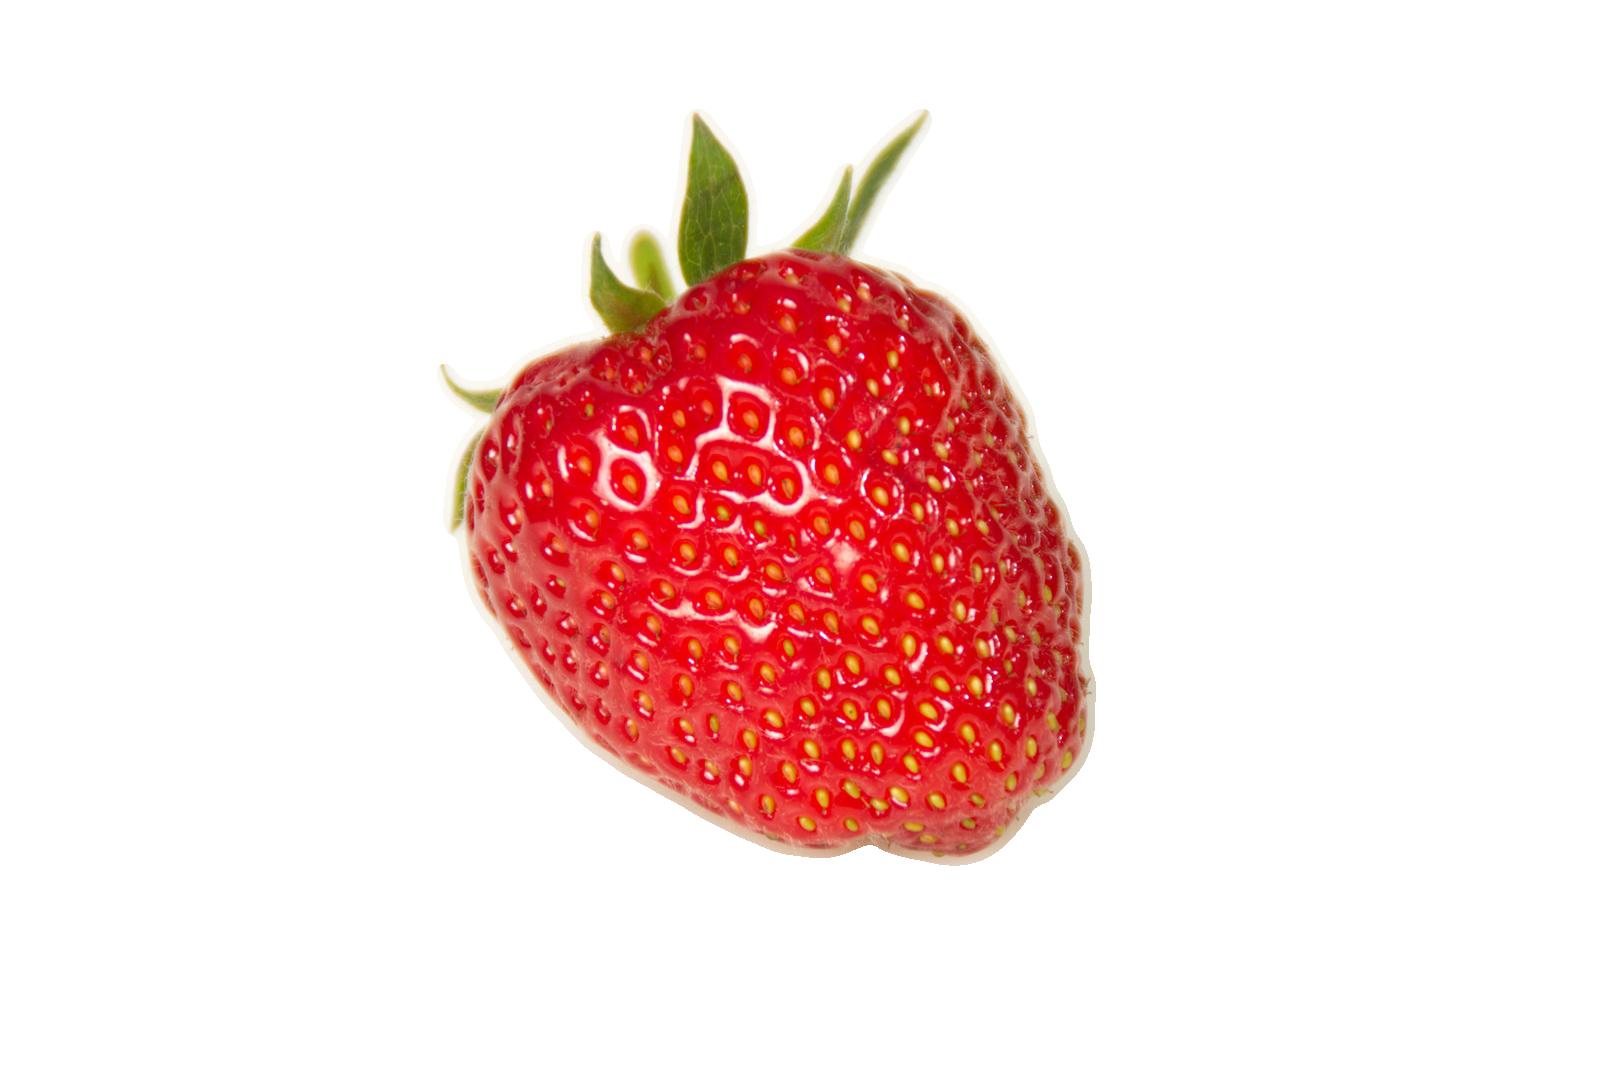 schmid erdbeeren erdbeeren aus dem marchfeld t glich frisch gepfl ckt. Black Bedroom Furniture Sets. Home Design Ideas